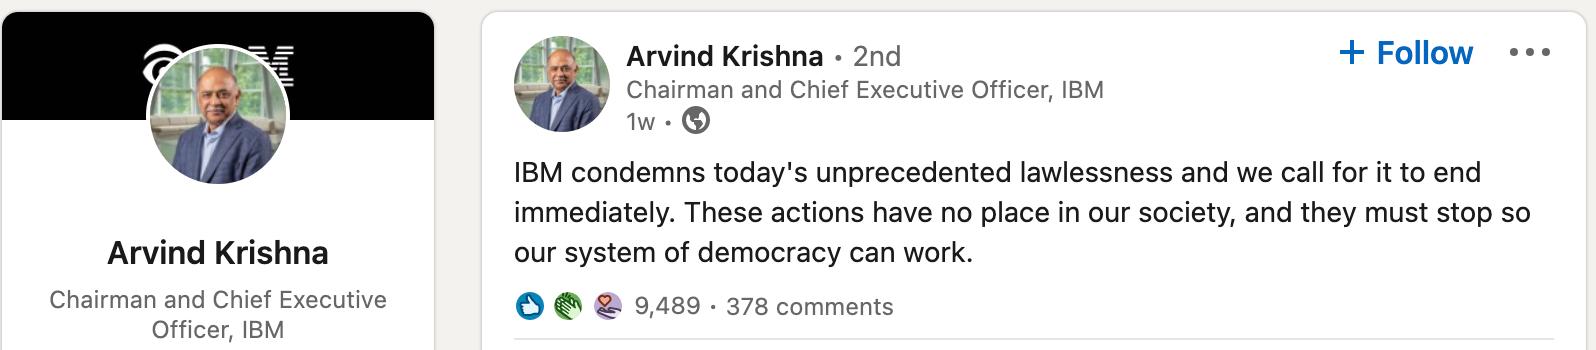 Arvind Krishna